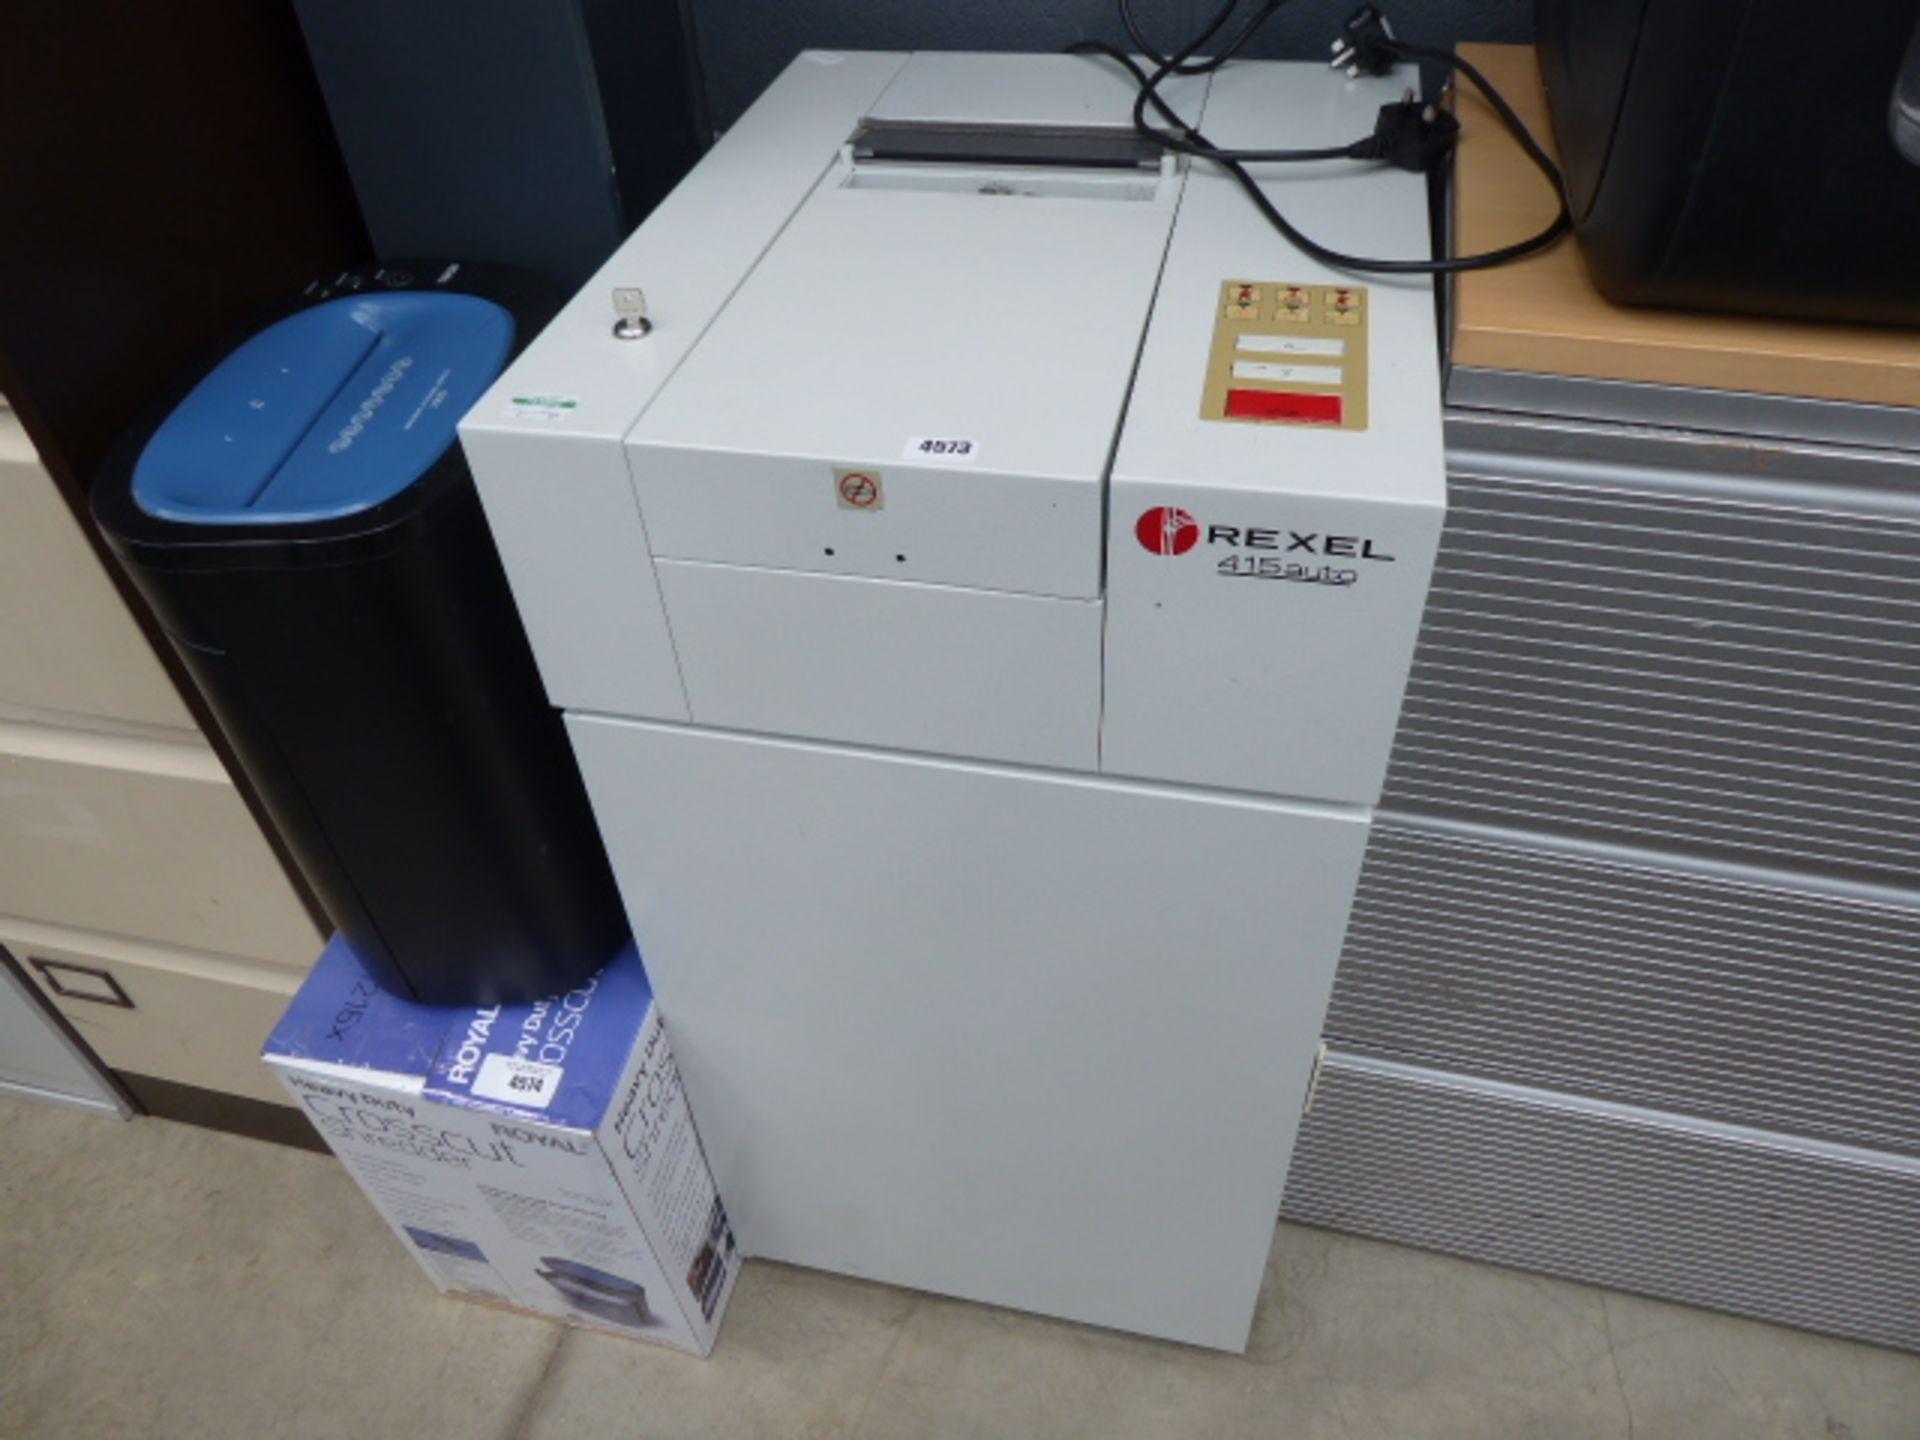 Large industrial style Rexel paper shredder